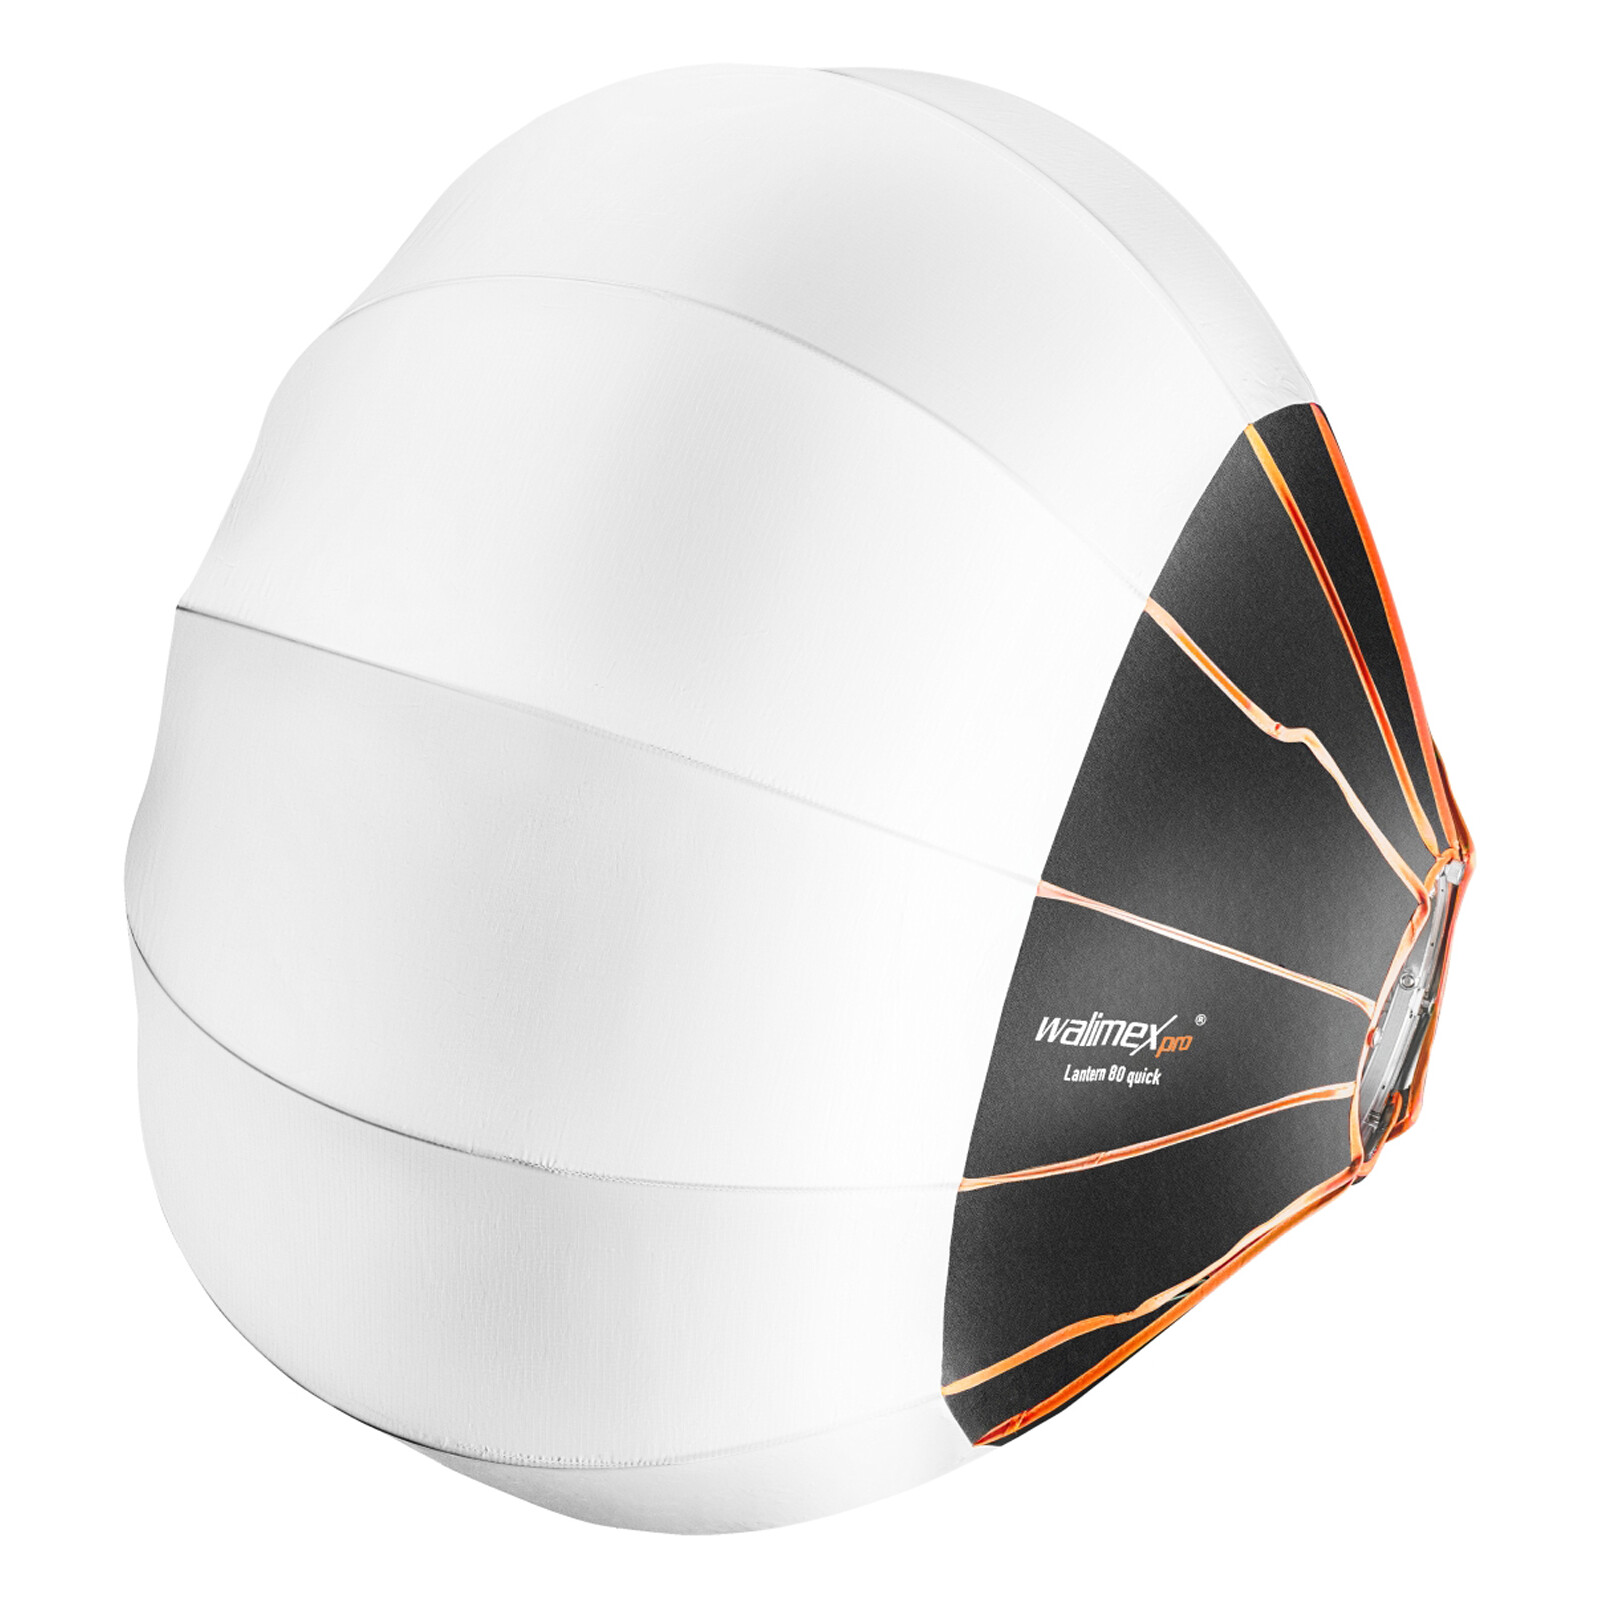 Walimex pro 360° Ambient Light Softbox 80cm Elinchrom